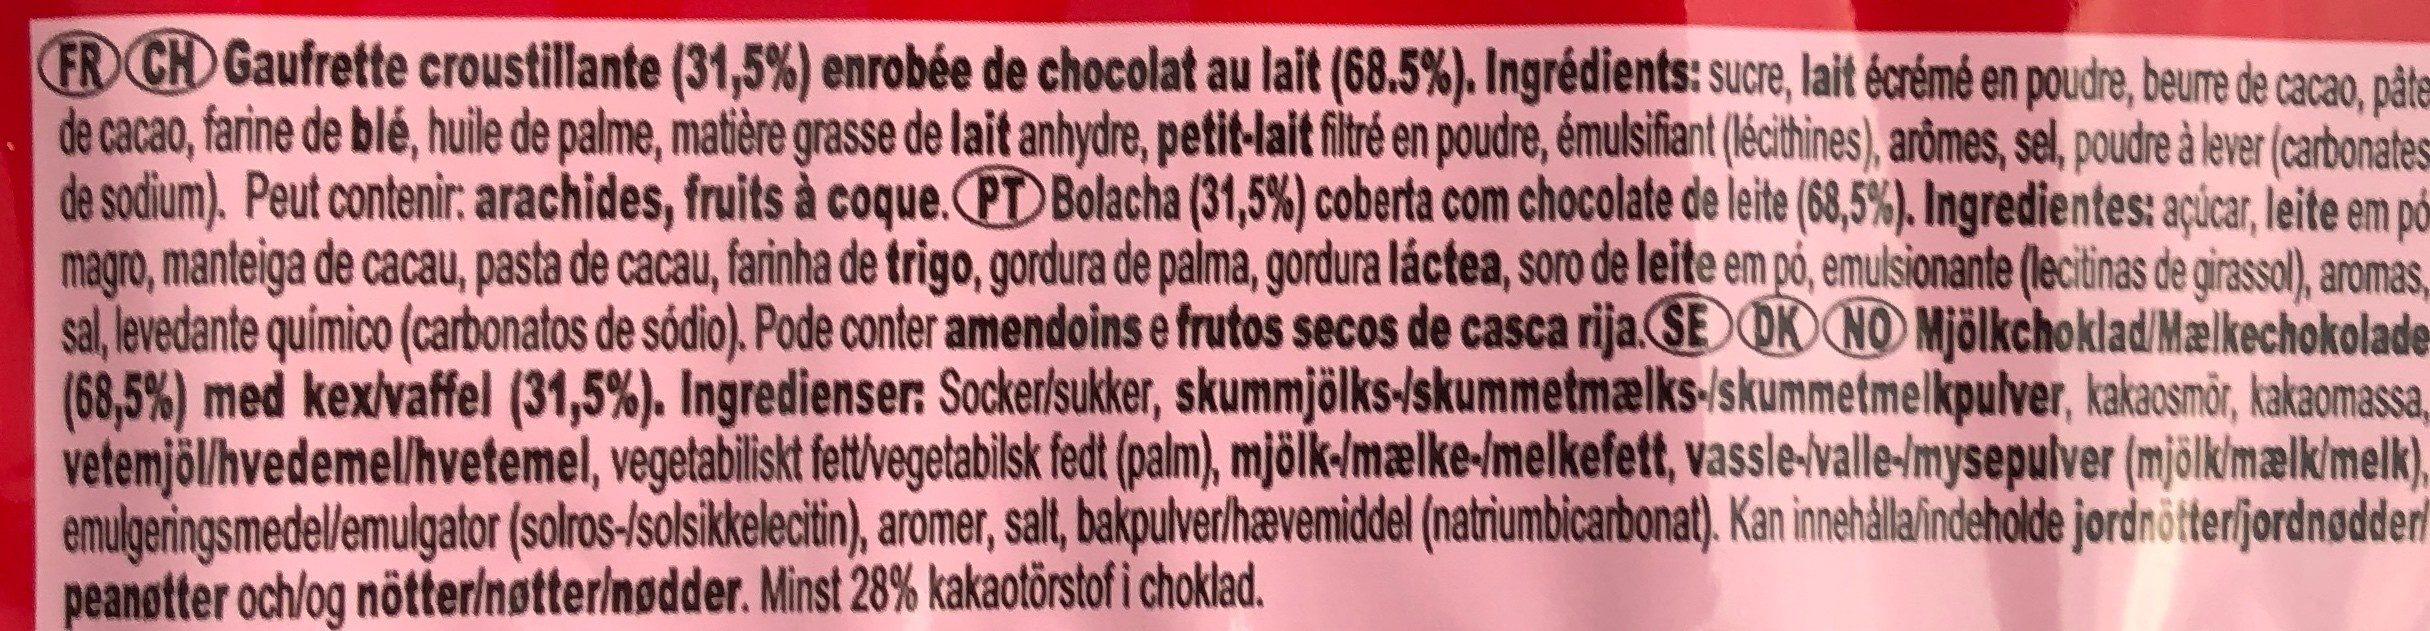 Kit Kat Chunky - Ingrédients - fr